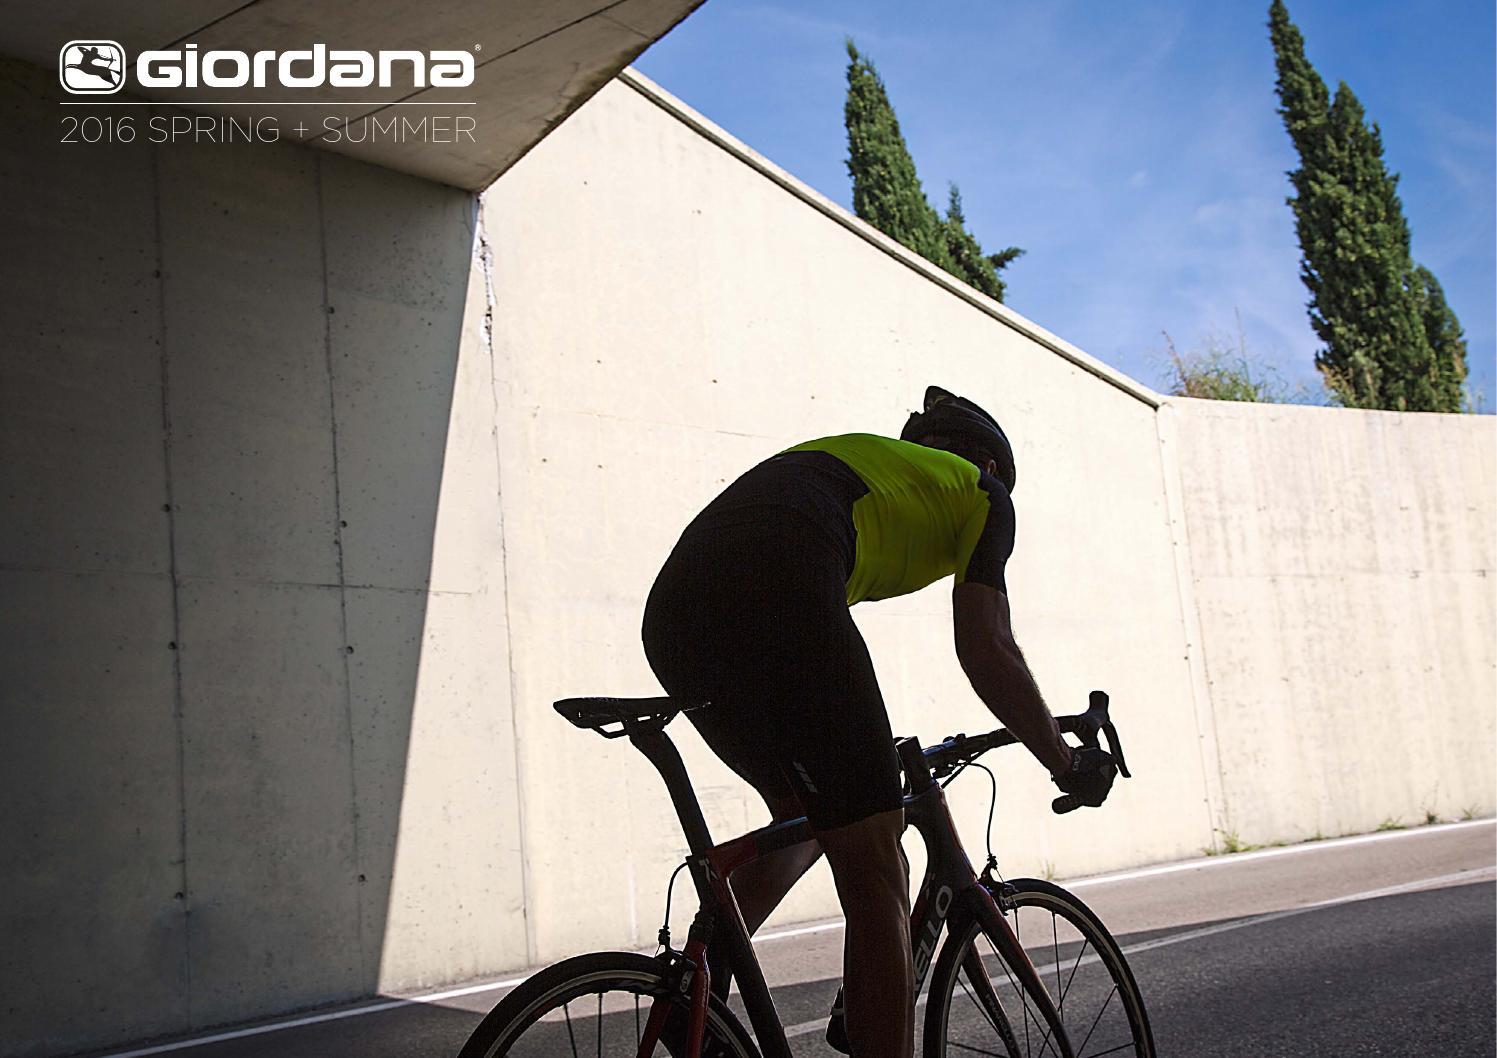 Giordana 2016 Spring+Summer Catalog by Giordana Cycling - issuu 9960dcee0